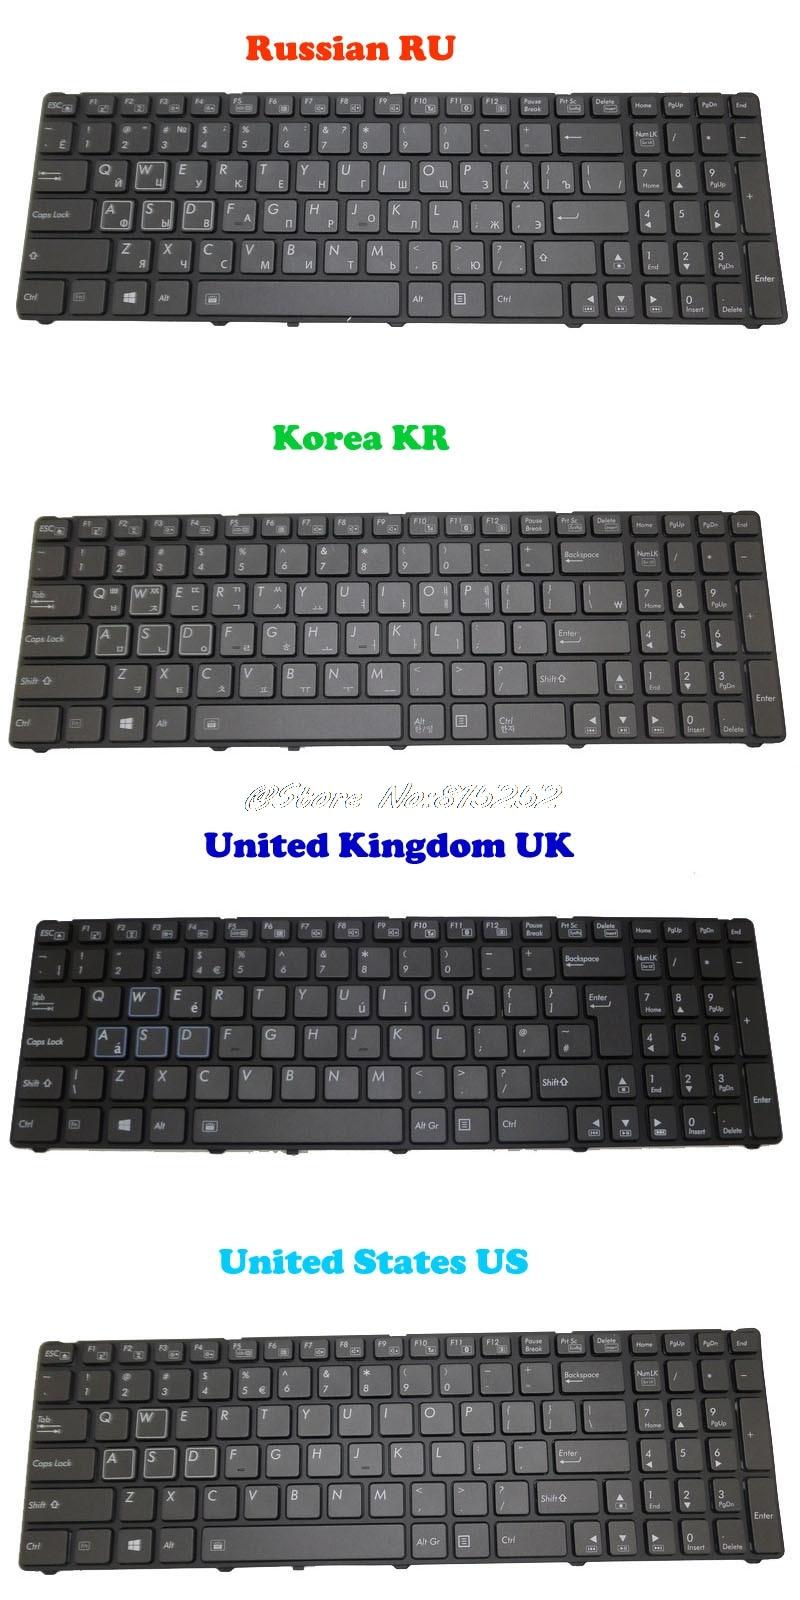 Backlit Keyboard For Gigabyte P25K P25W V2 P25W-CF1 P25W-CF2 P25W-CF3 P25X V2 P25K-CF2 V111465ES1 Korea KR Russian RU English UK new for asus zx50jx zx50vw zx50vx zx70vw zx70 zx70v backlit russian ru laptop keyboard layout black color